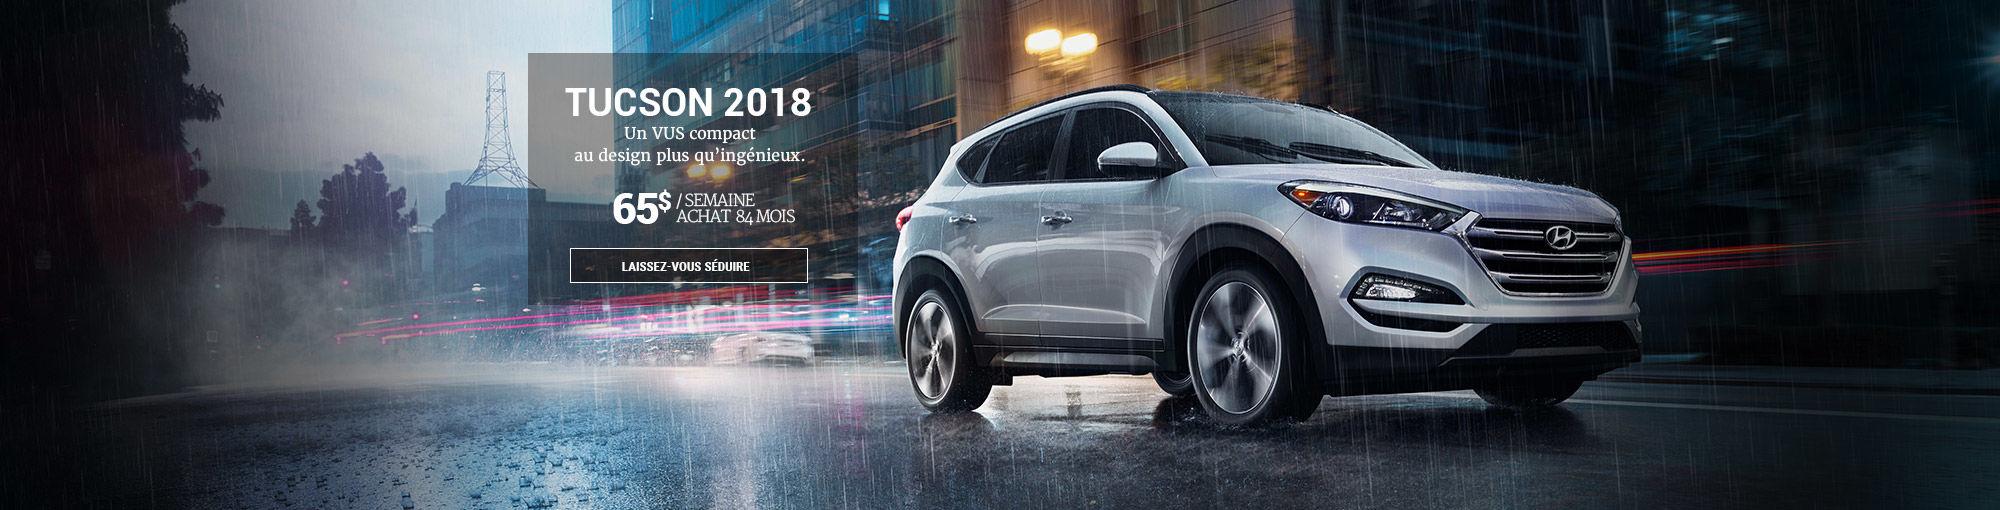 Hyundai Tucson 2018 header novembre